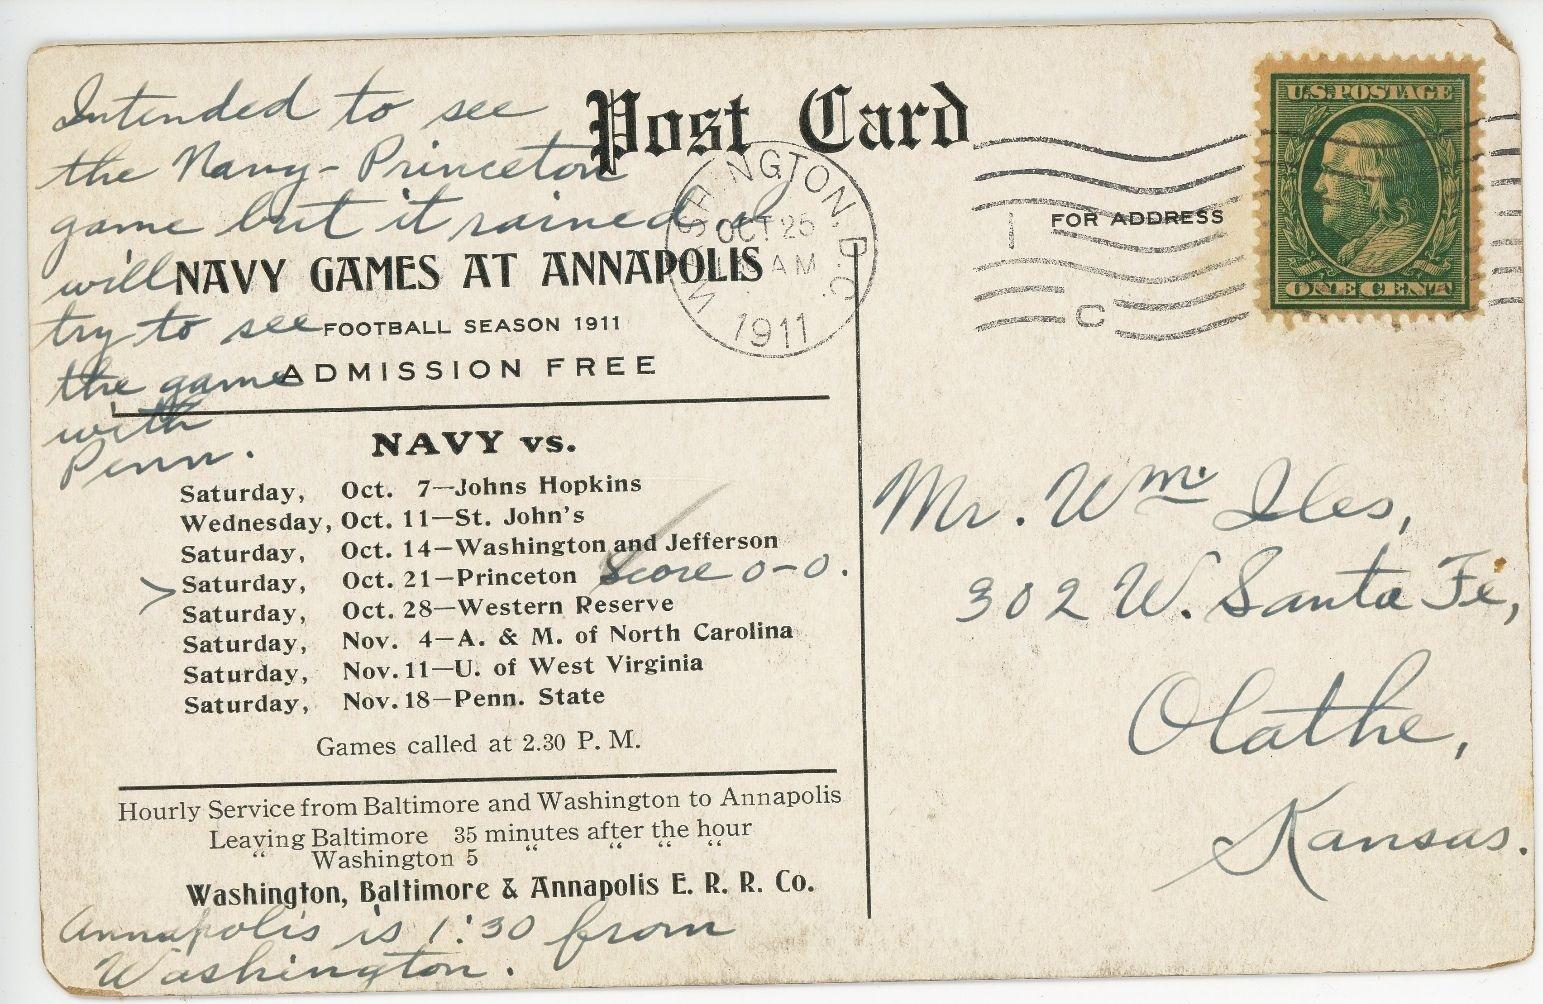 Washington-Baltimore-and-Annapolis-Railroad-Postcard-3-2.jpg